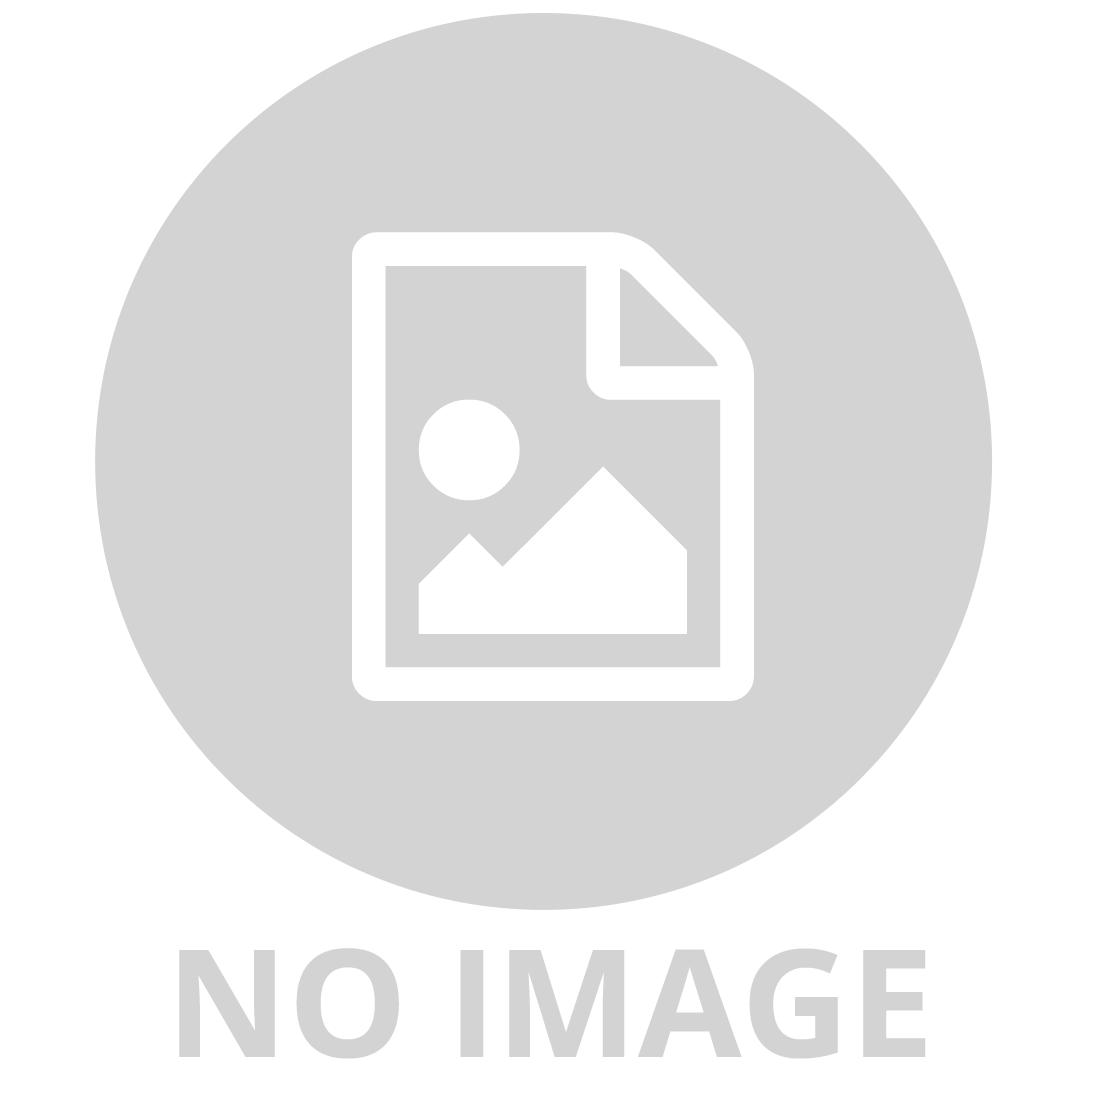 TAMIYA 1/48 DOUGLAS A-1J SKYRAIDER MODEL KIT